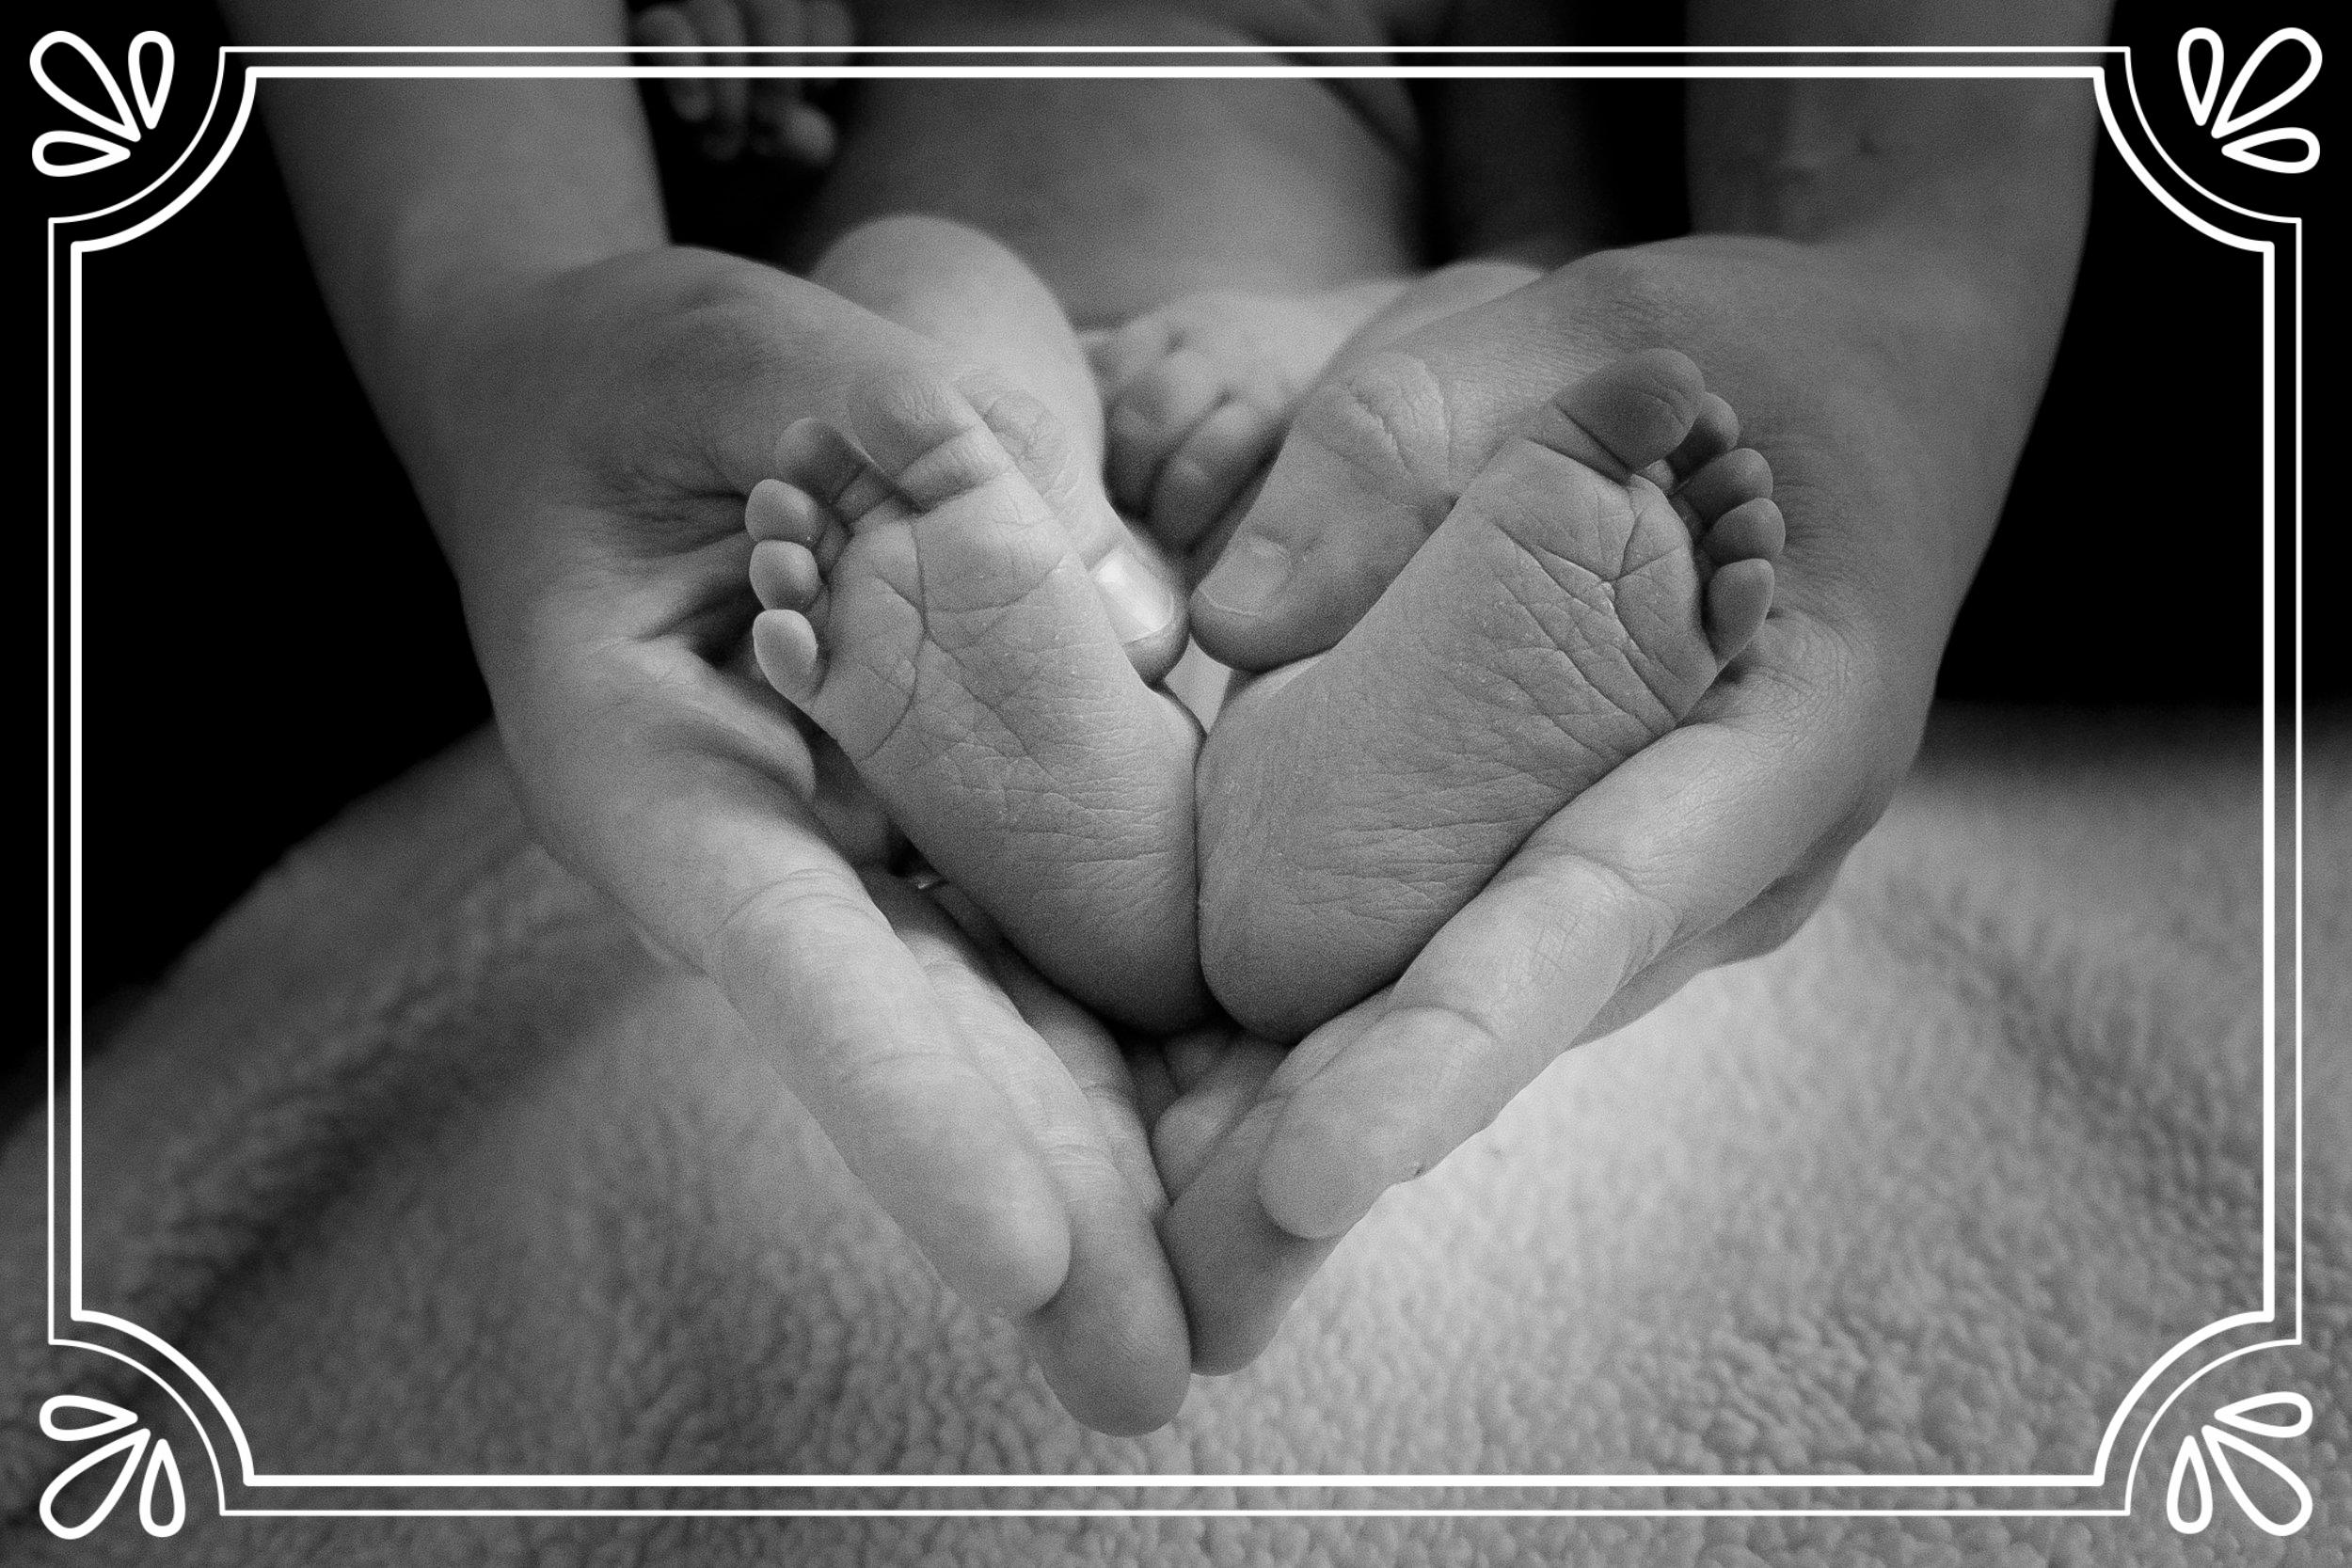 baby-feet-1527456.jpg